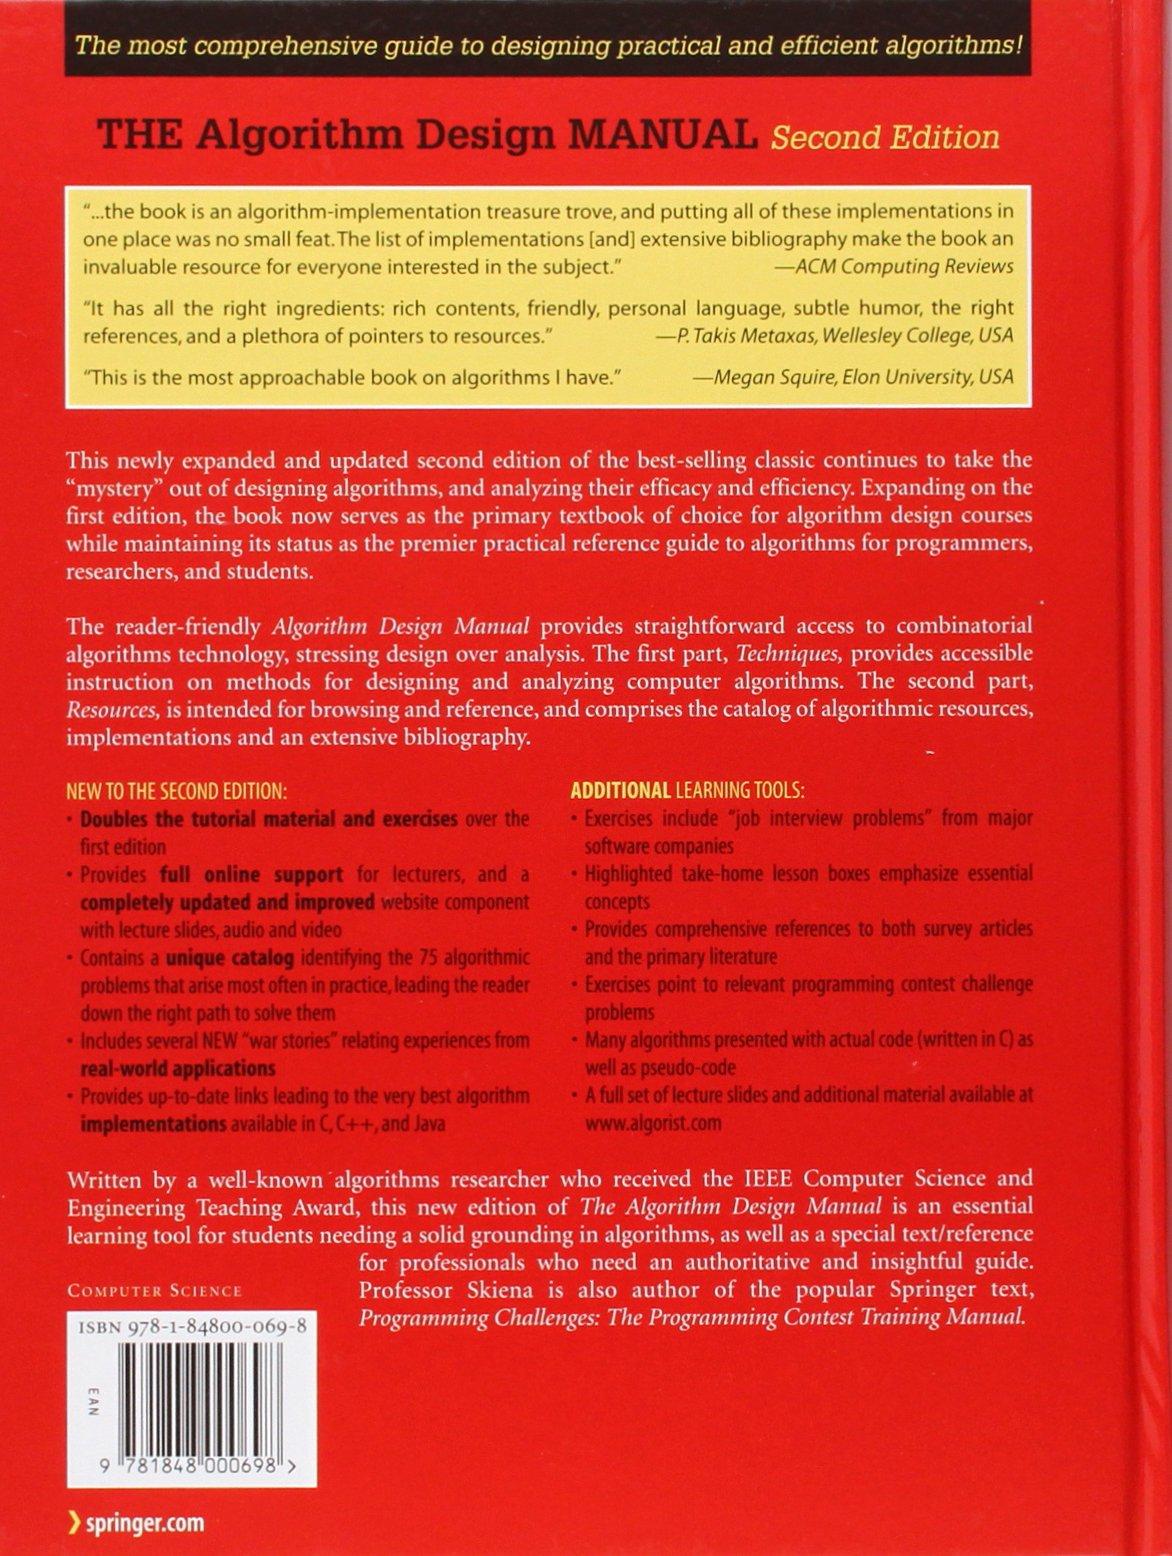 The Algorithm Design Manual by imusti